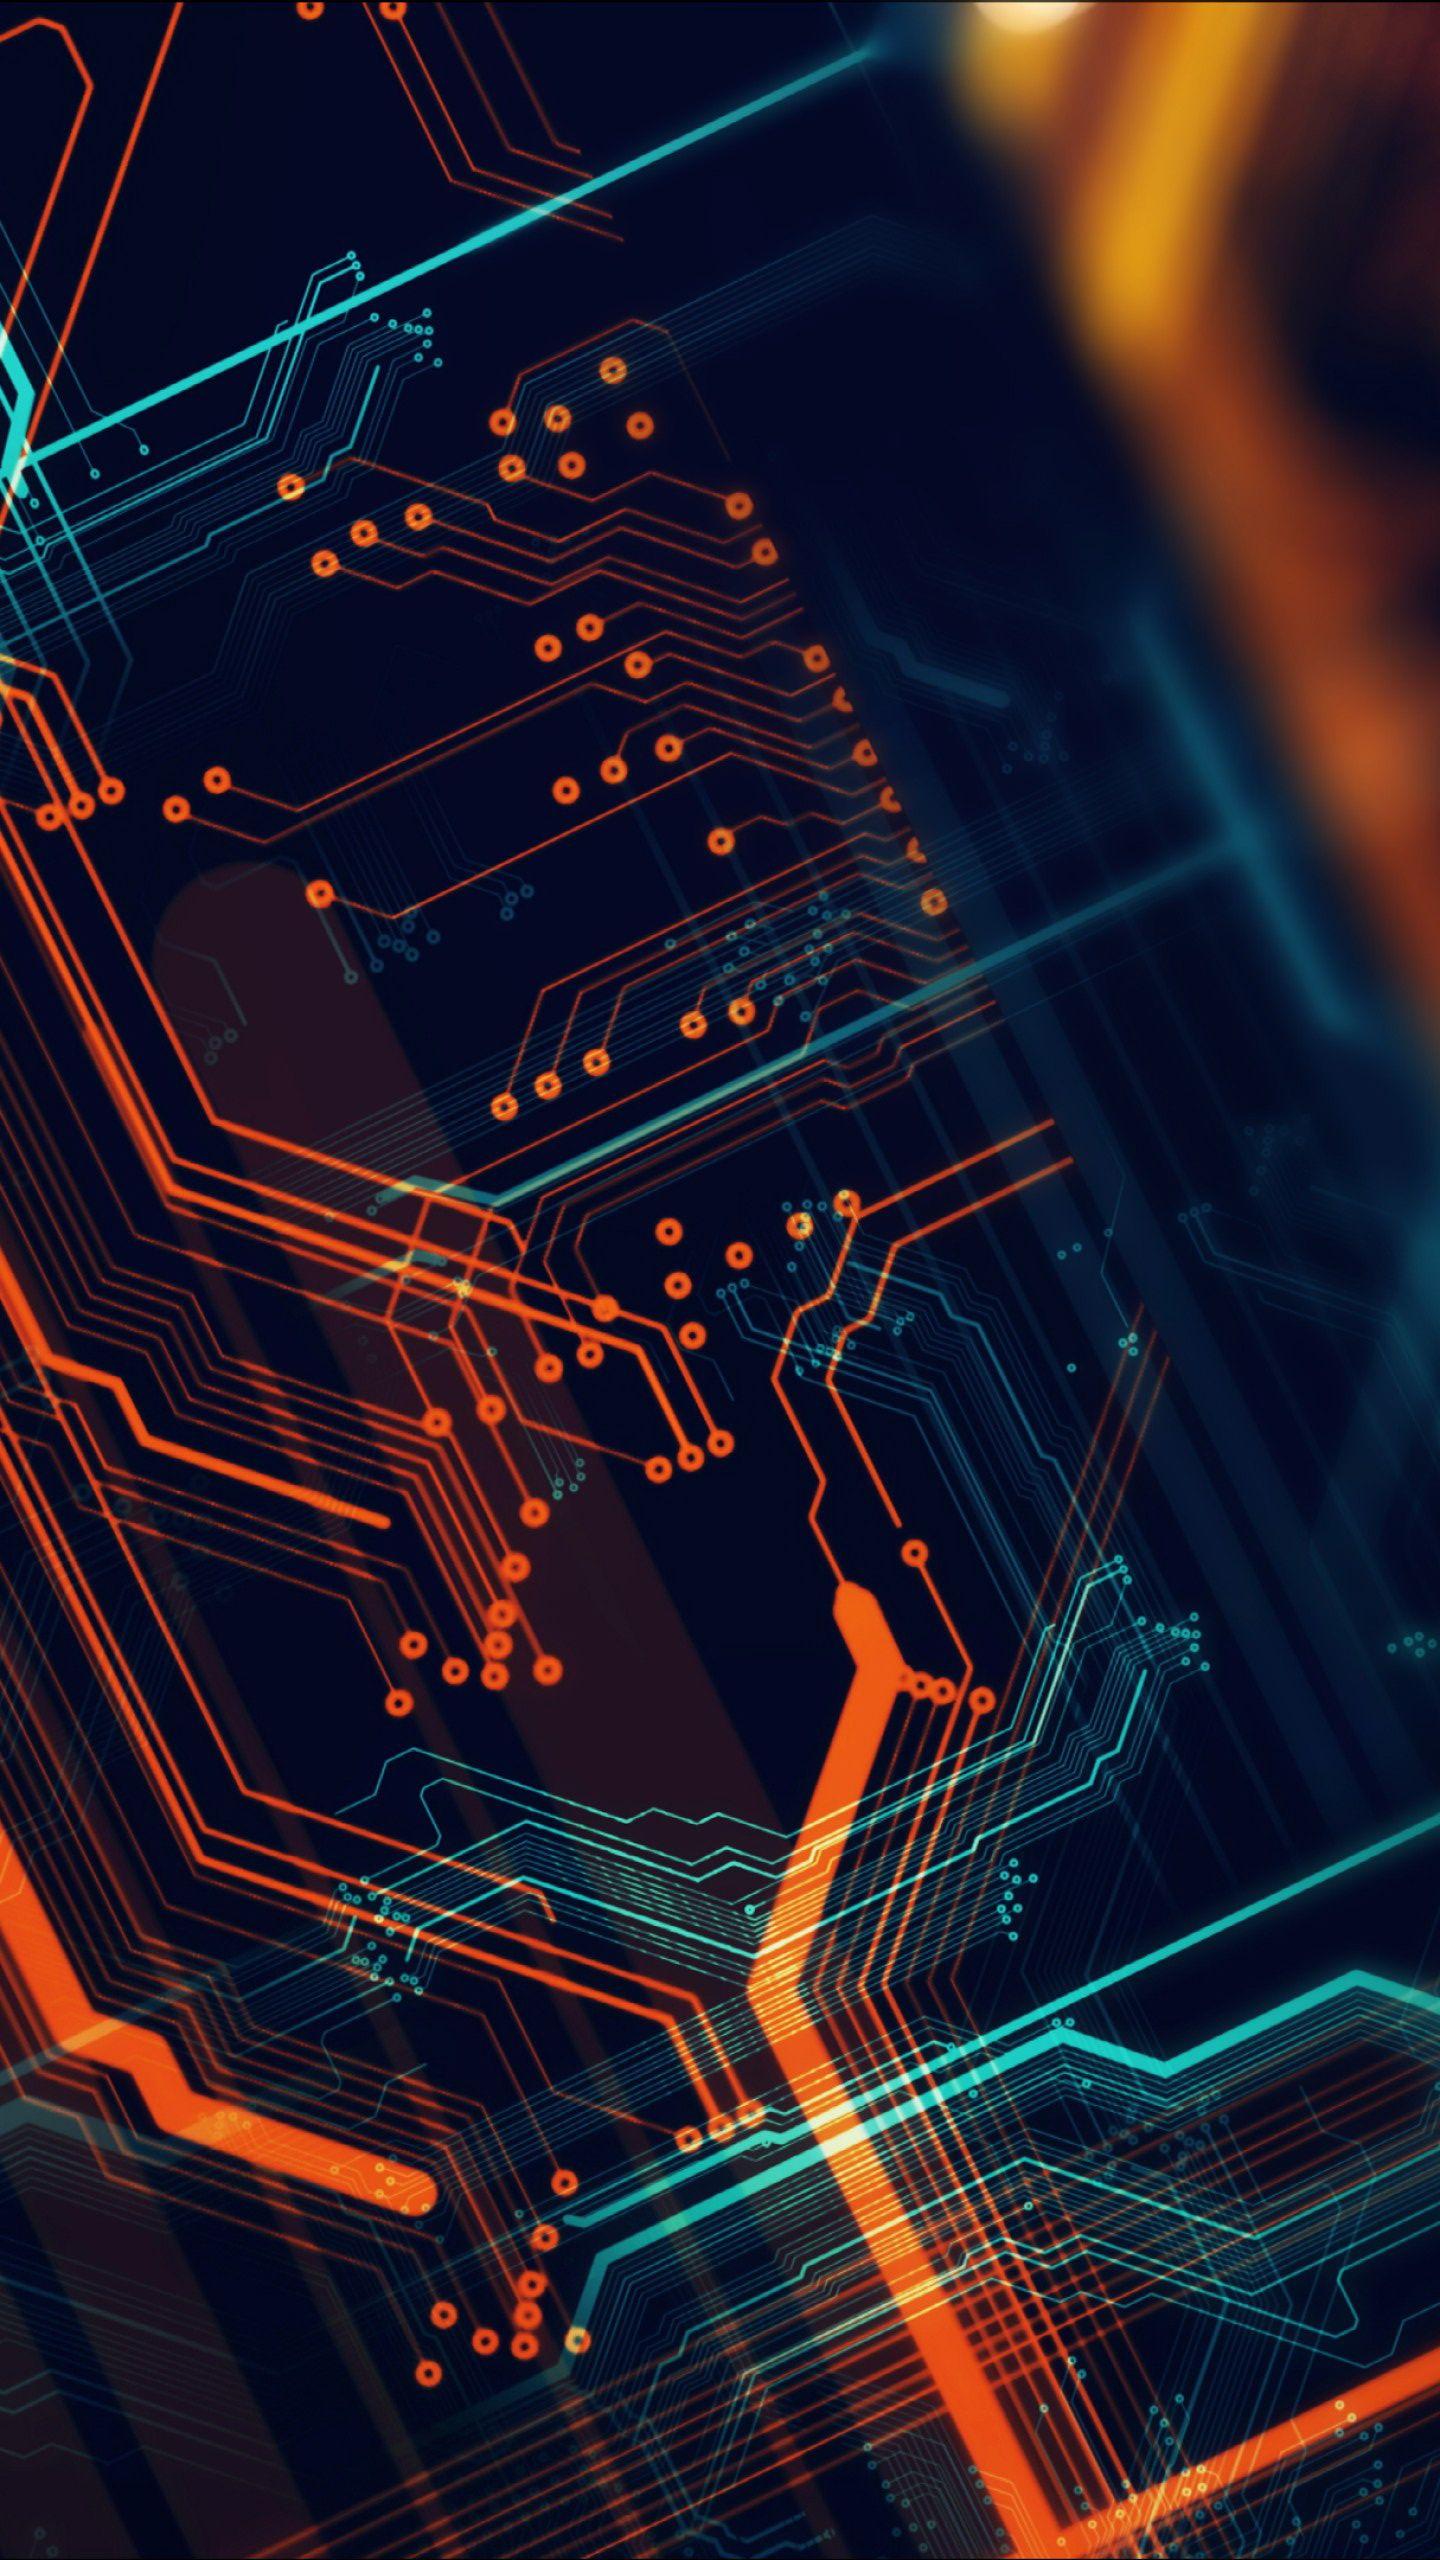 Free download MuchaTseBle Technology wallpaper Digital wallpaper ...